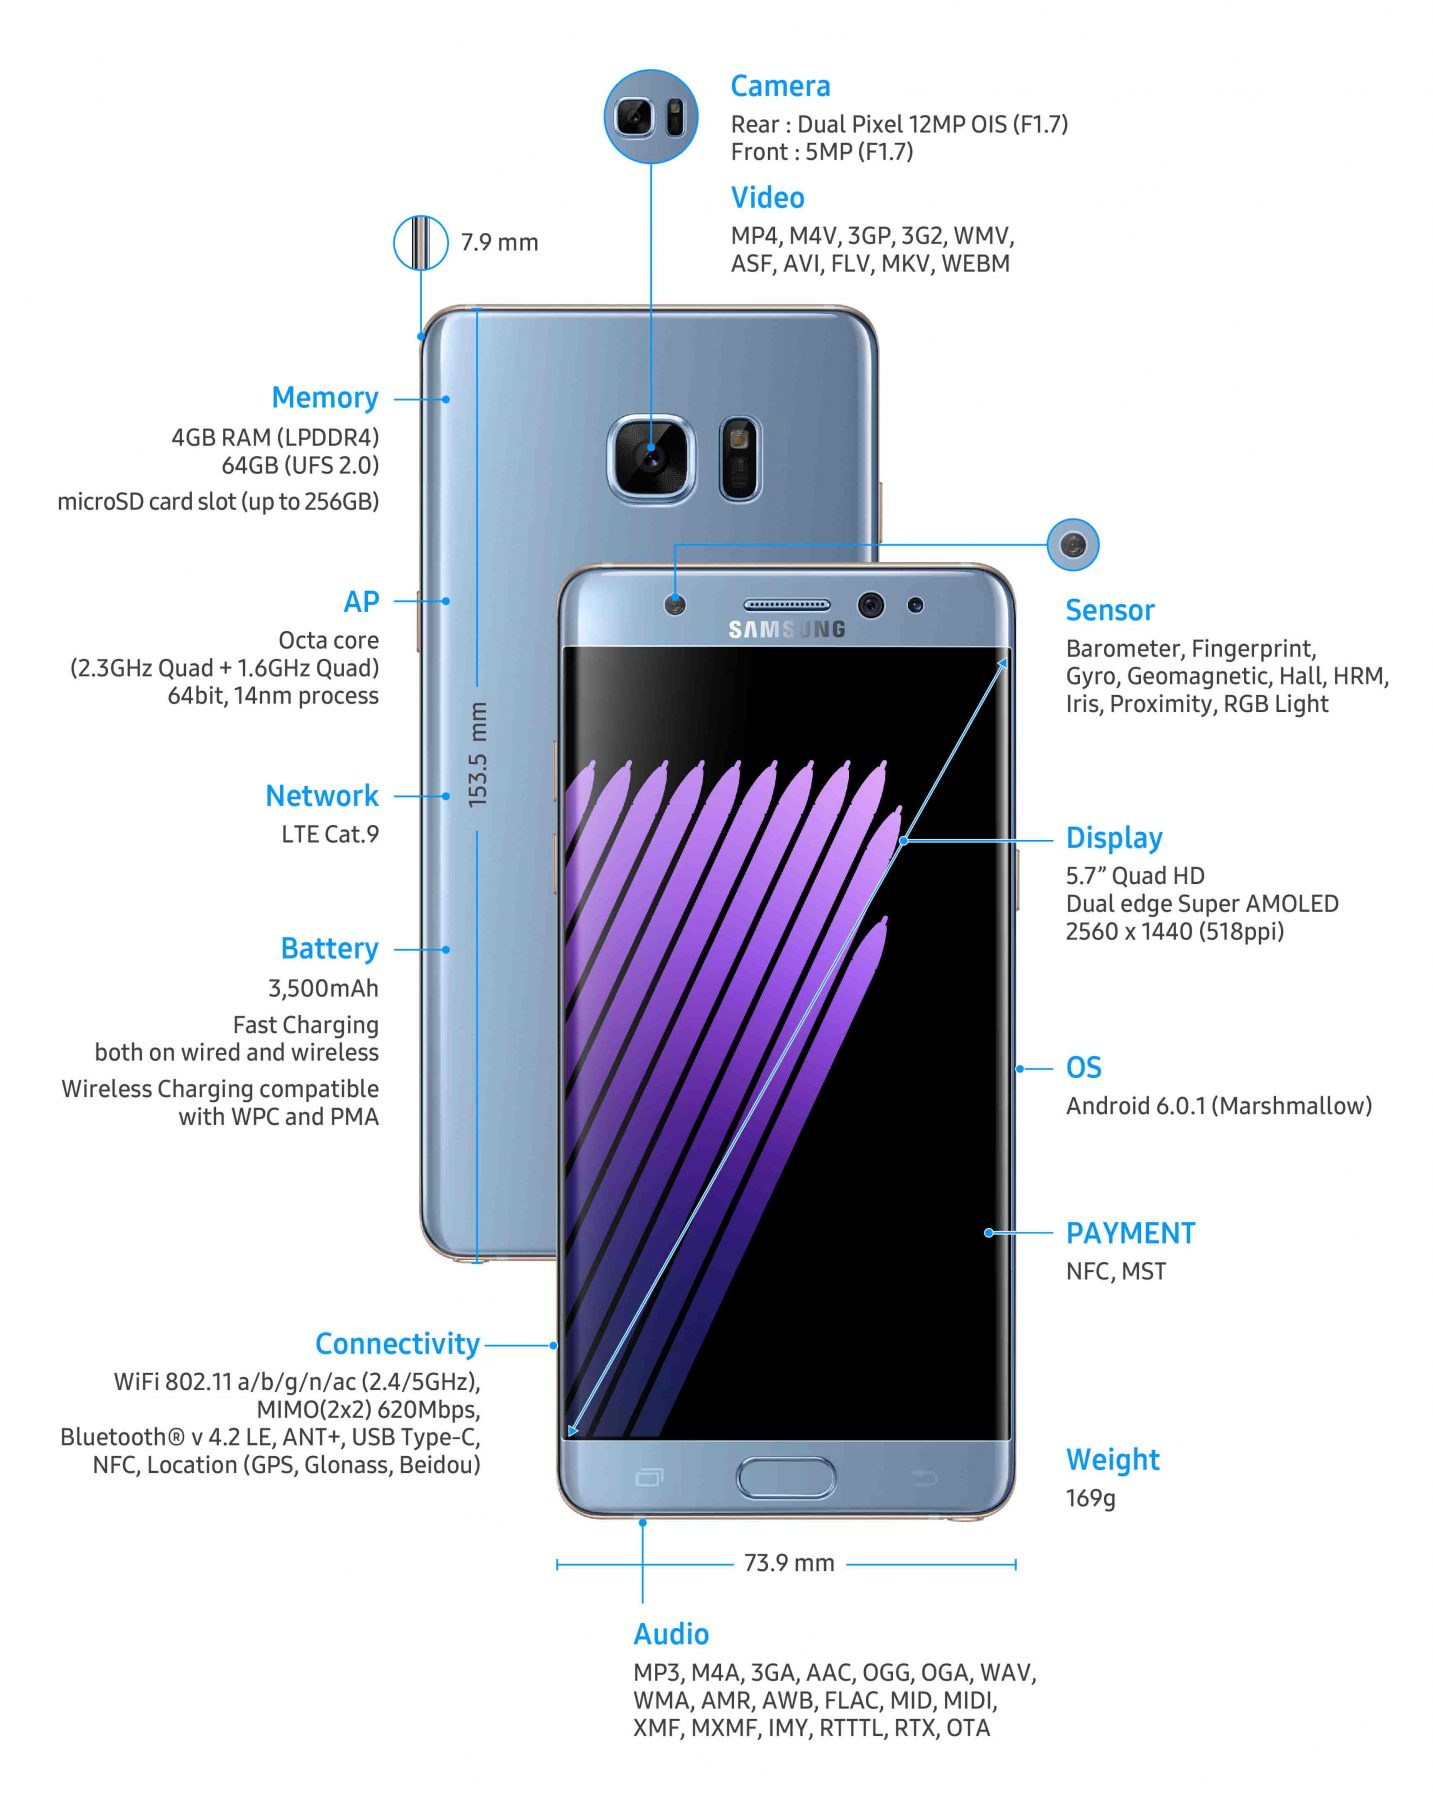 Galaxy Note 7 6GB RAM retail box